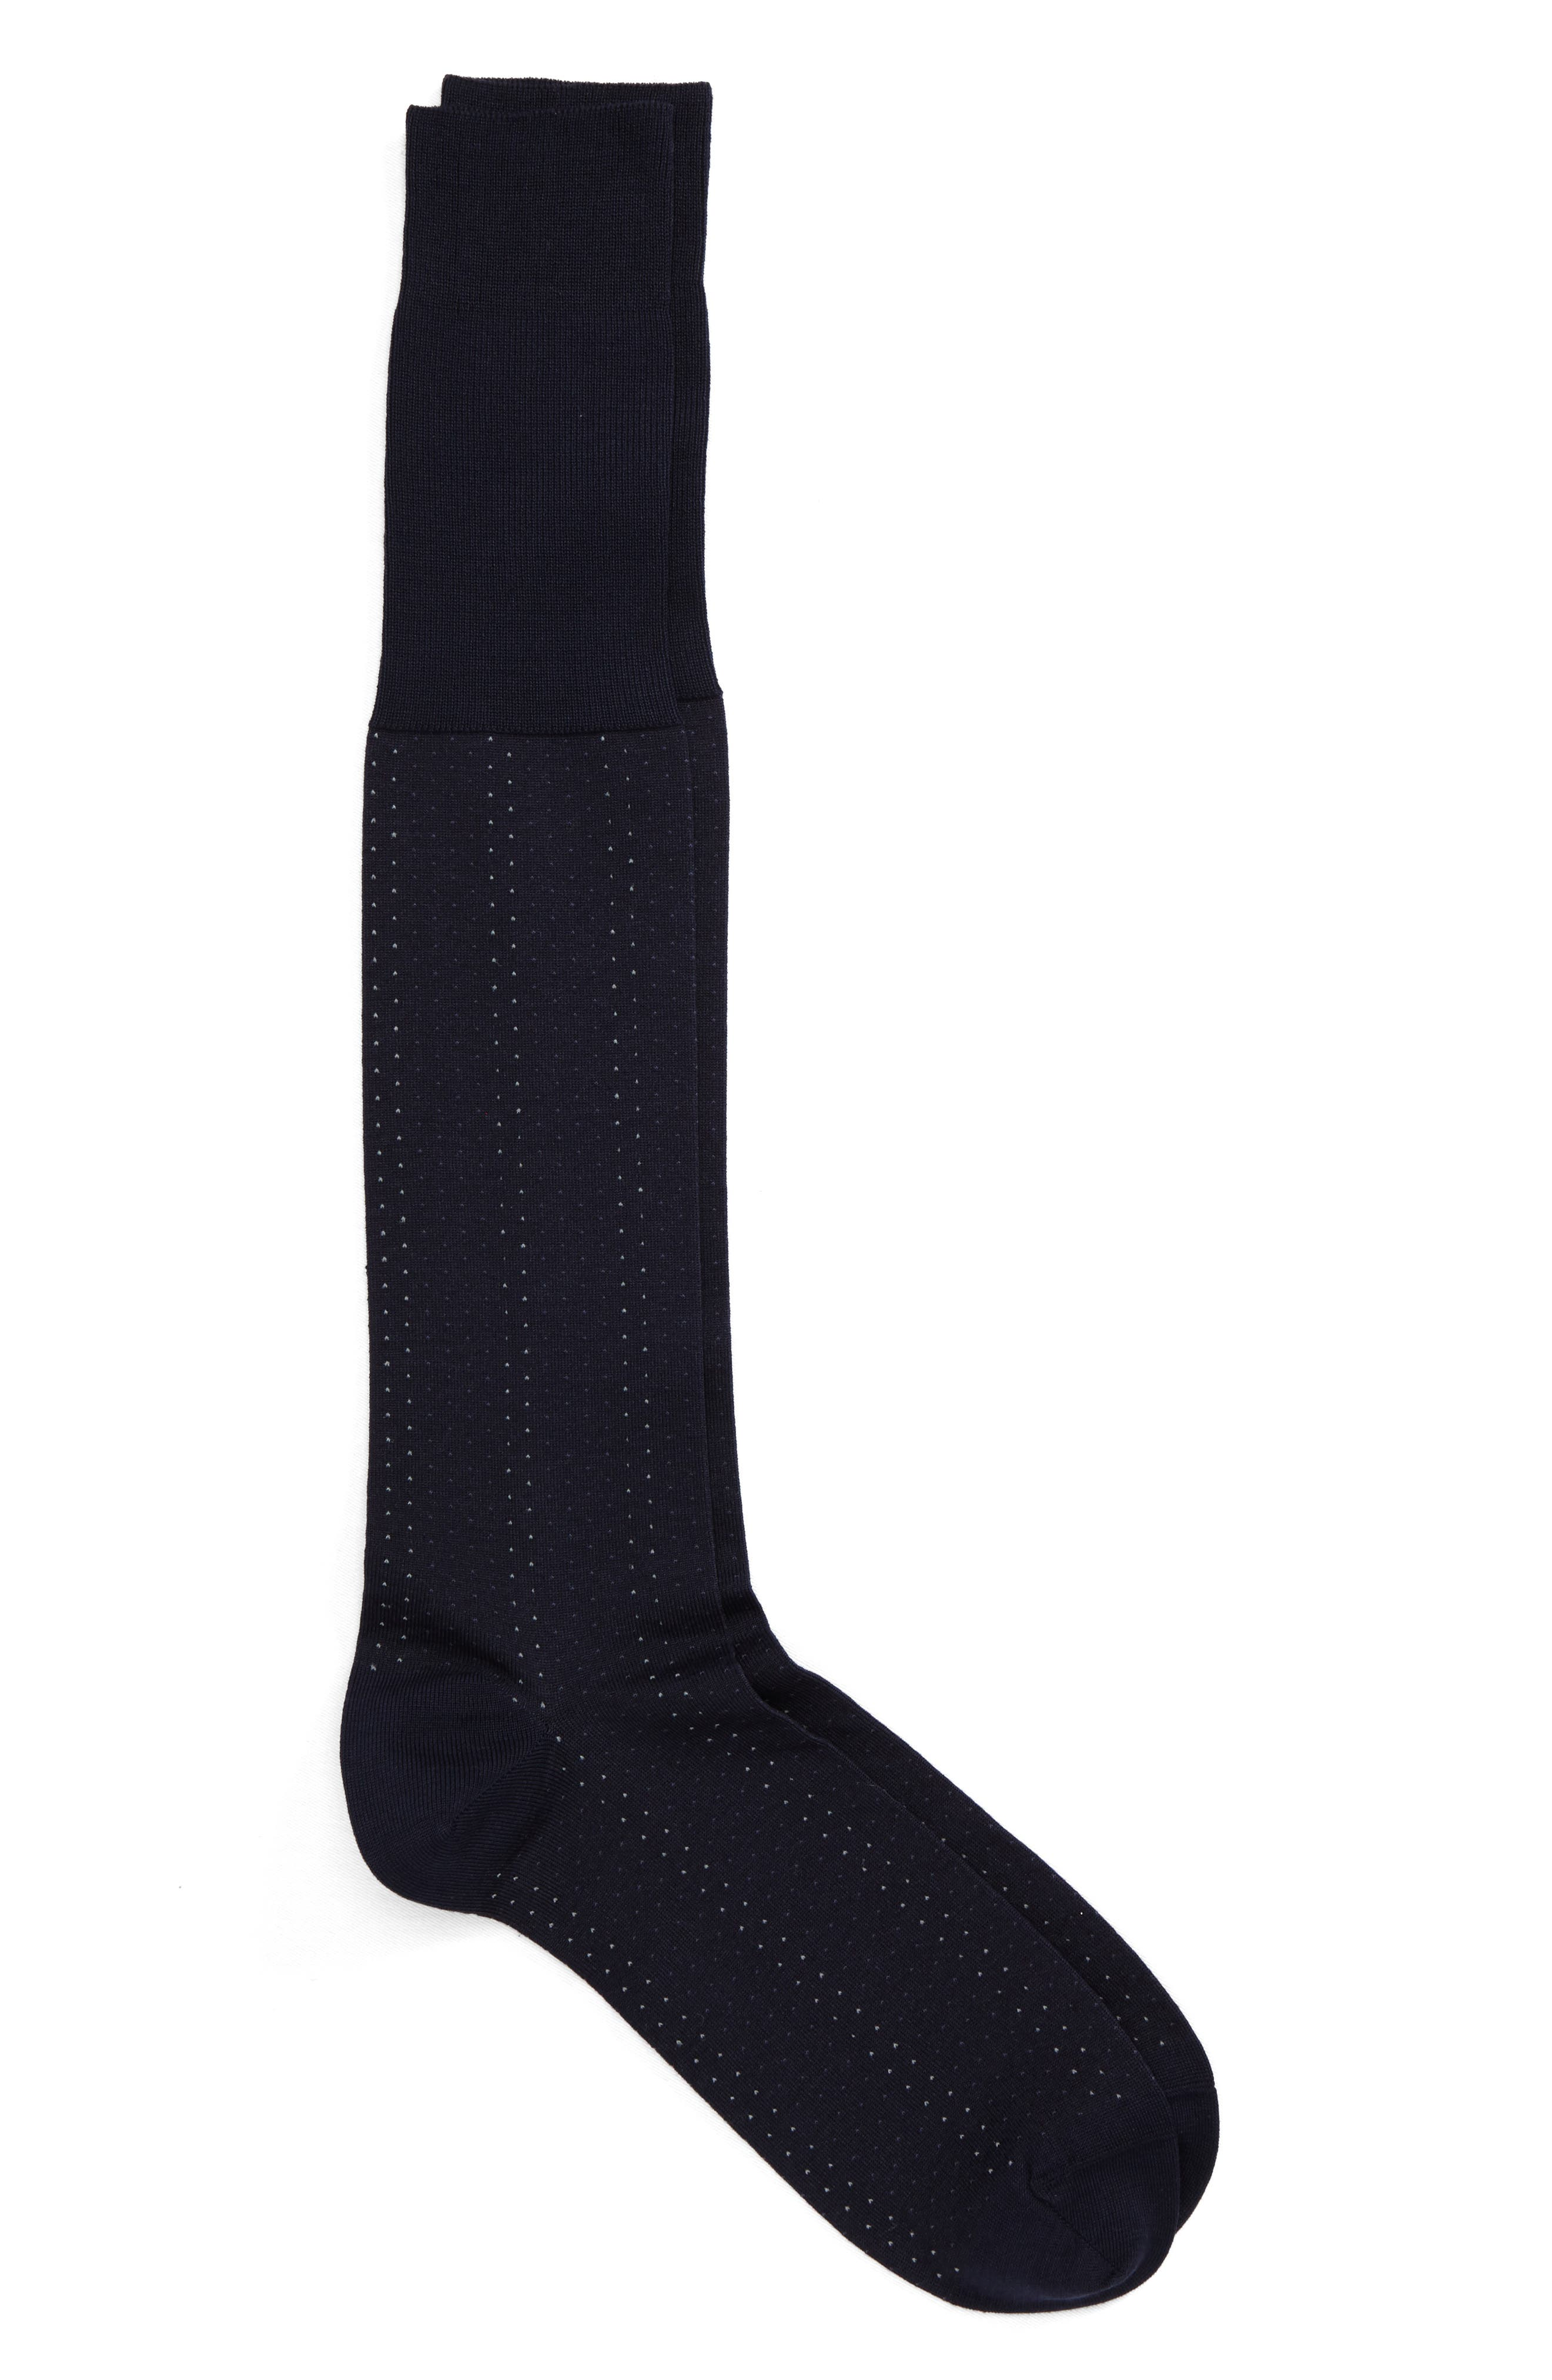 Mini Birdseye Over the Calf Socks,                             Main thumbnail 1, color,                             Navy/ Blue